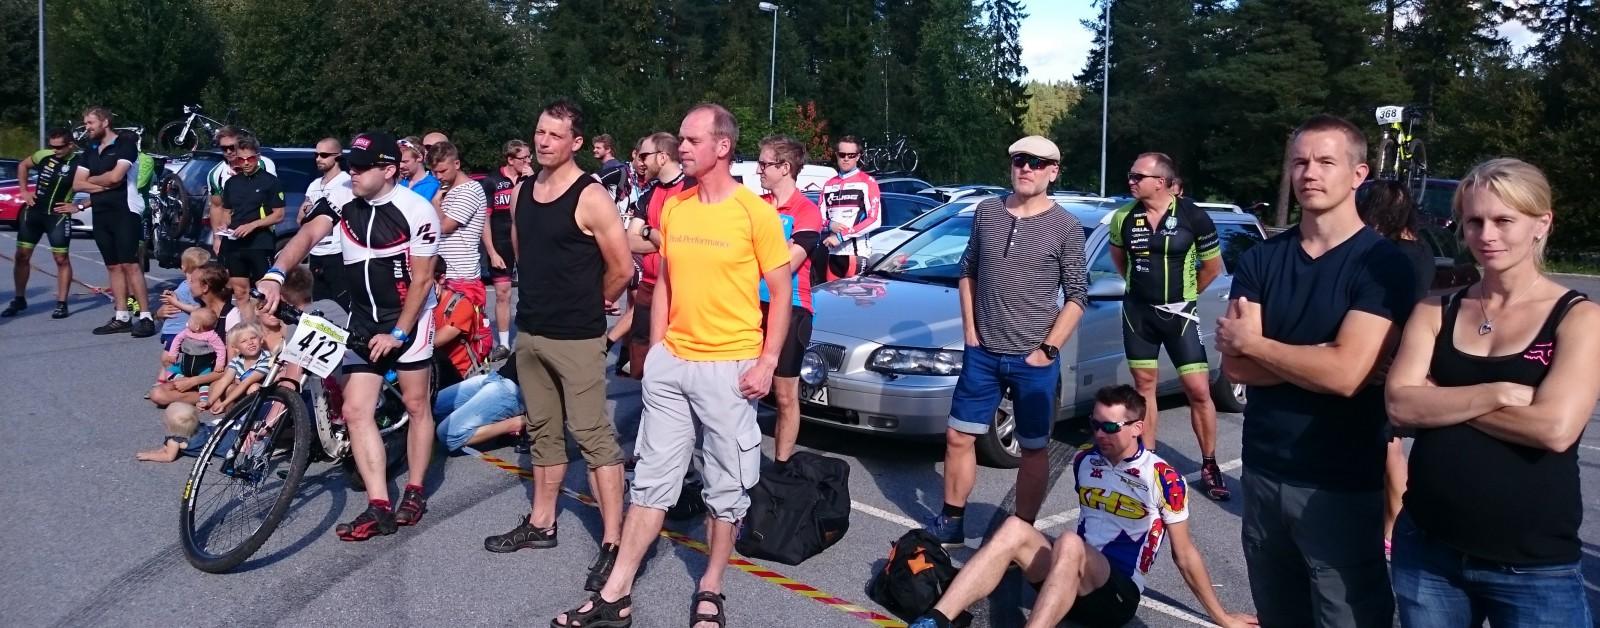 Publik Bikeboost 2015